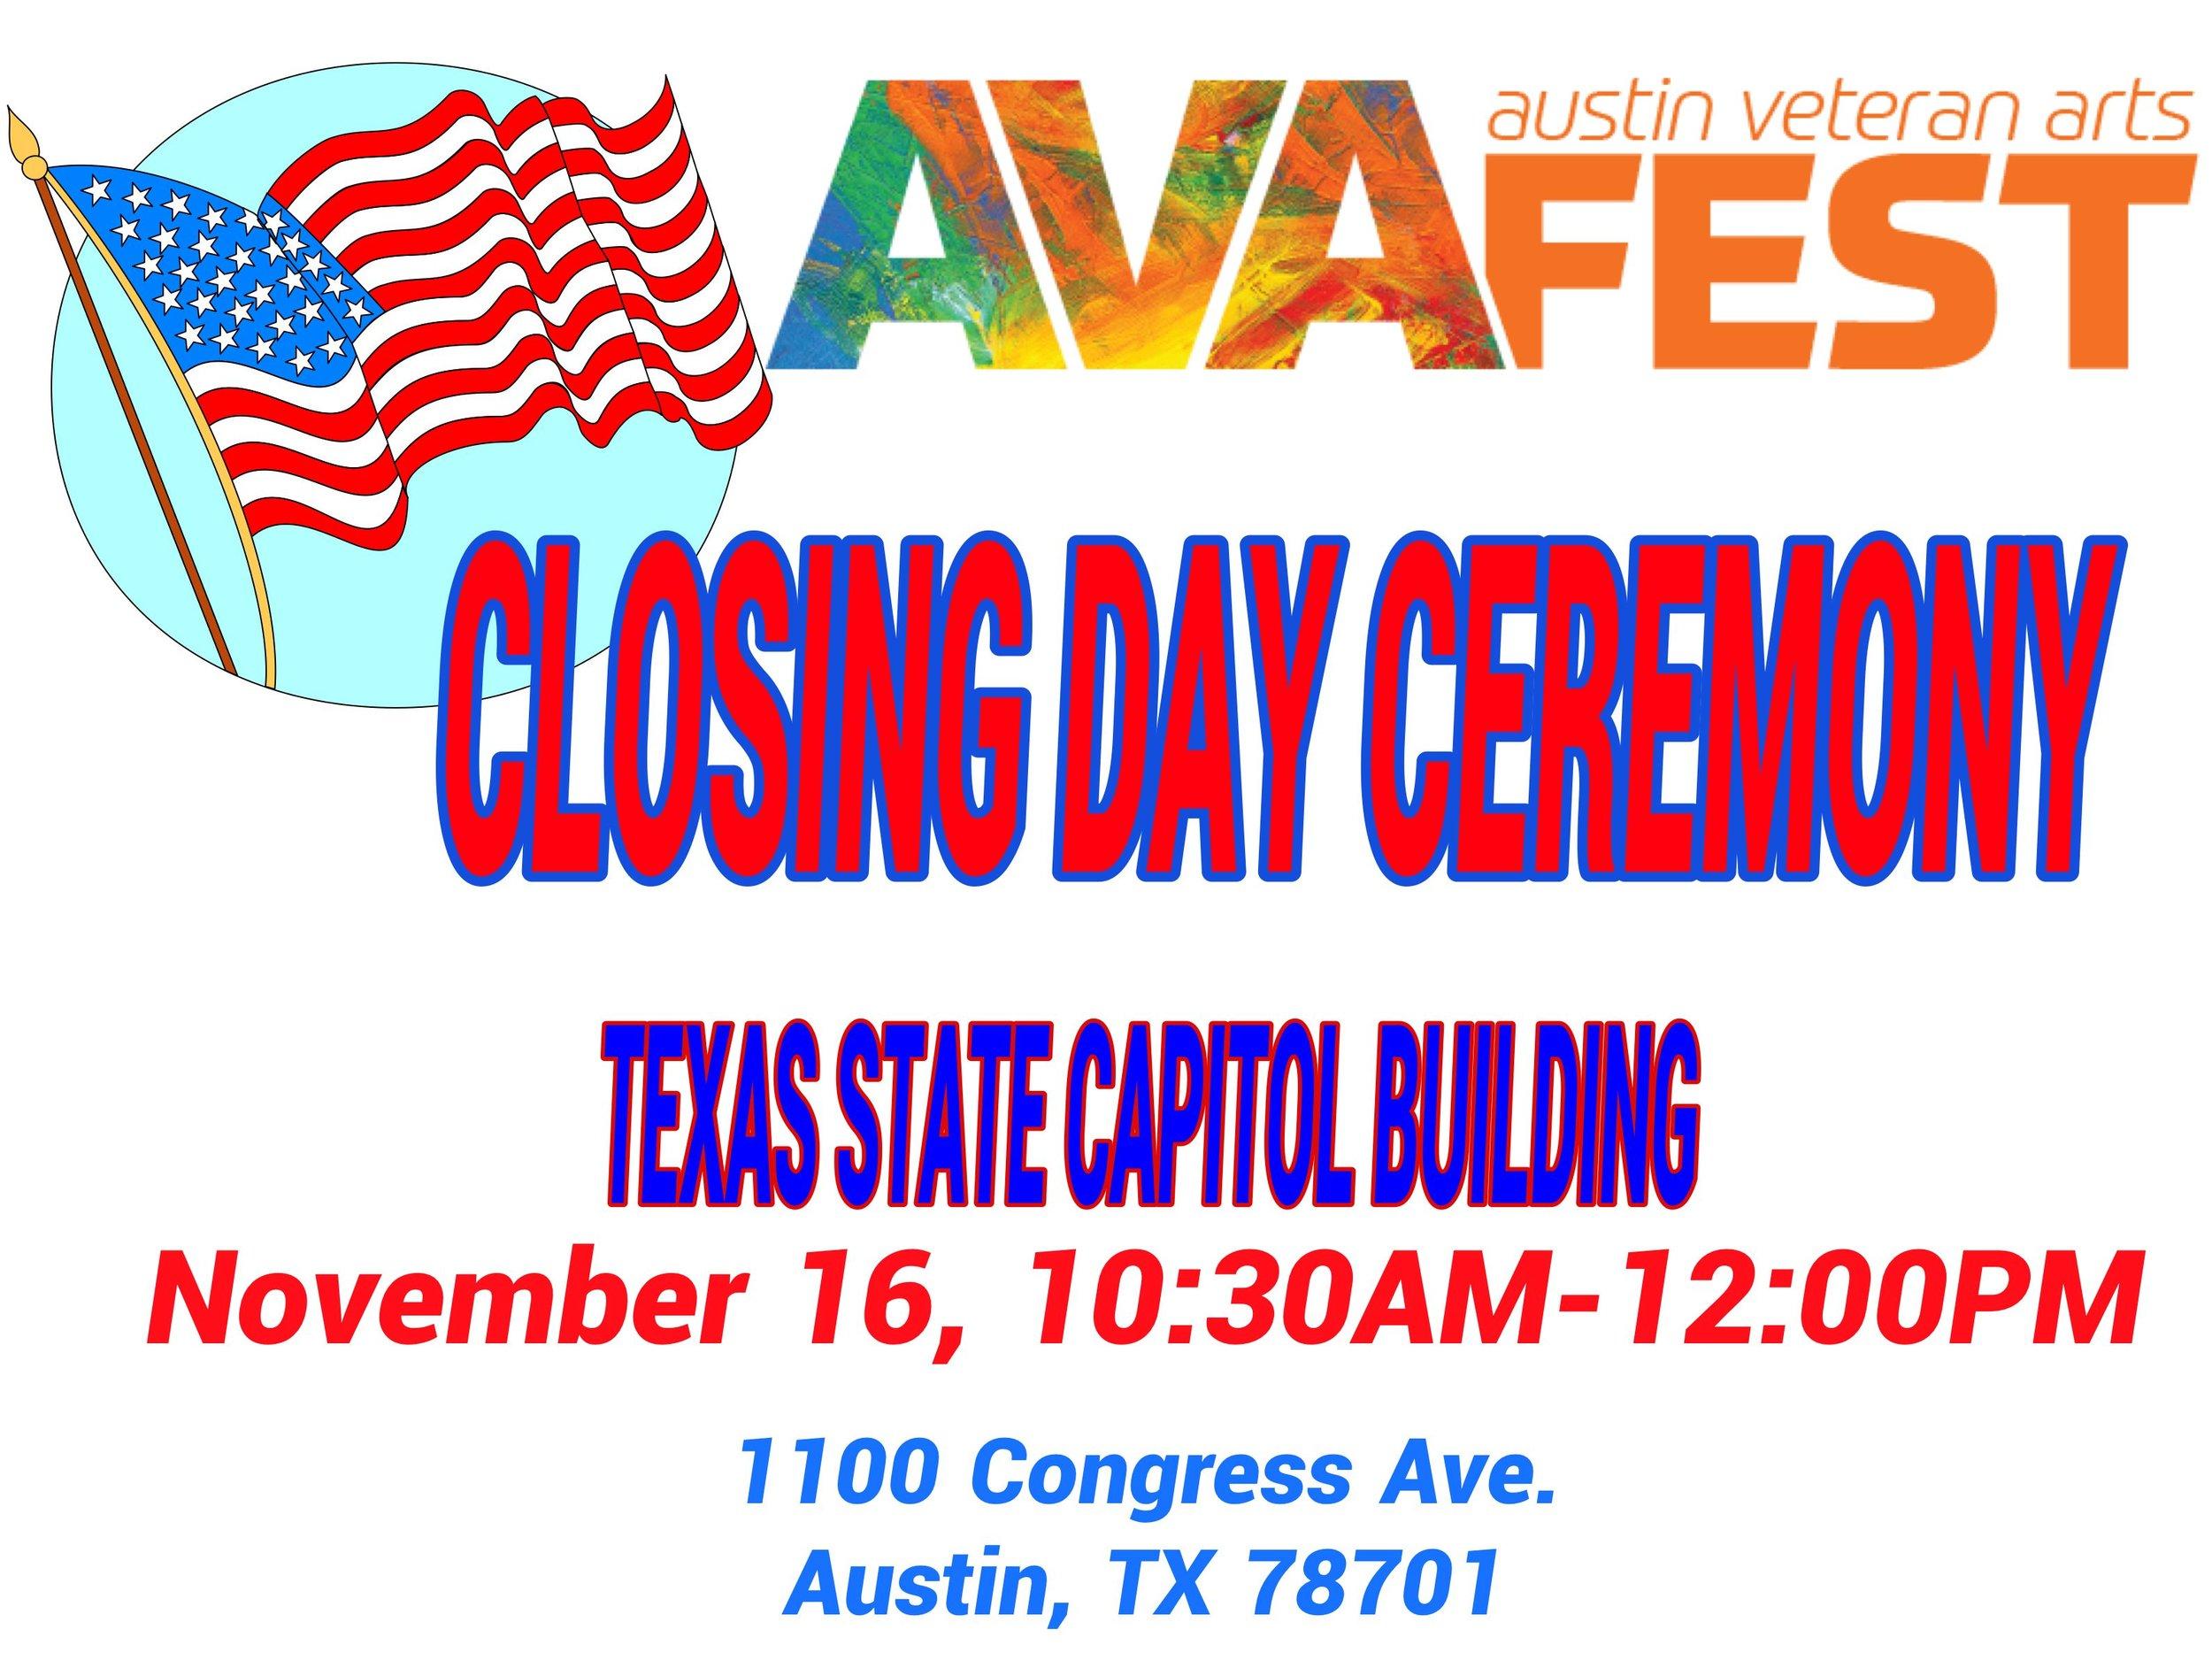 AVAFEST Closing Day Ceremony.jpeg